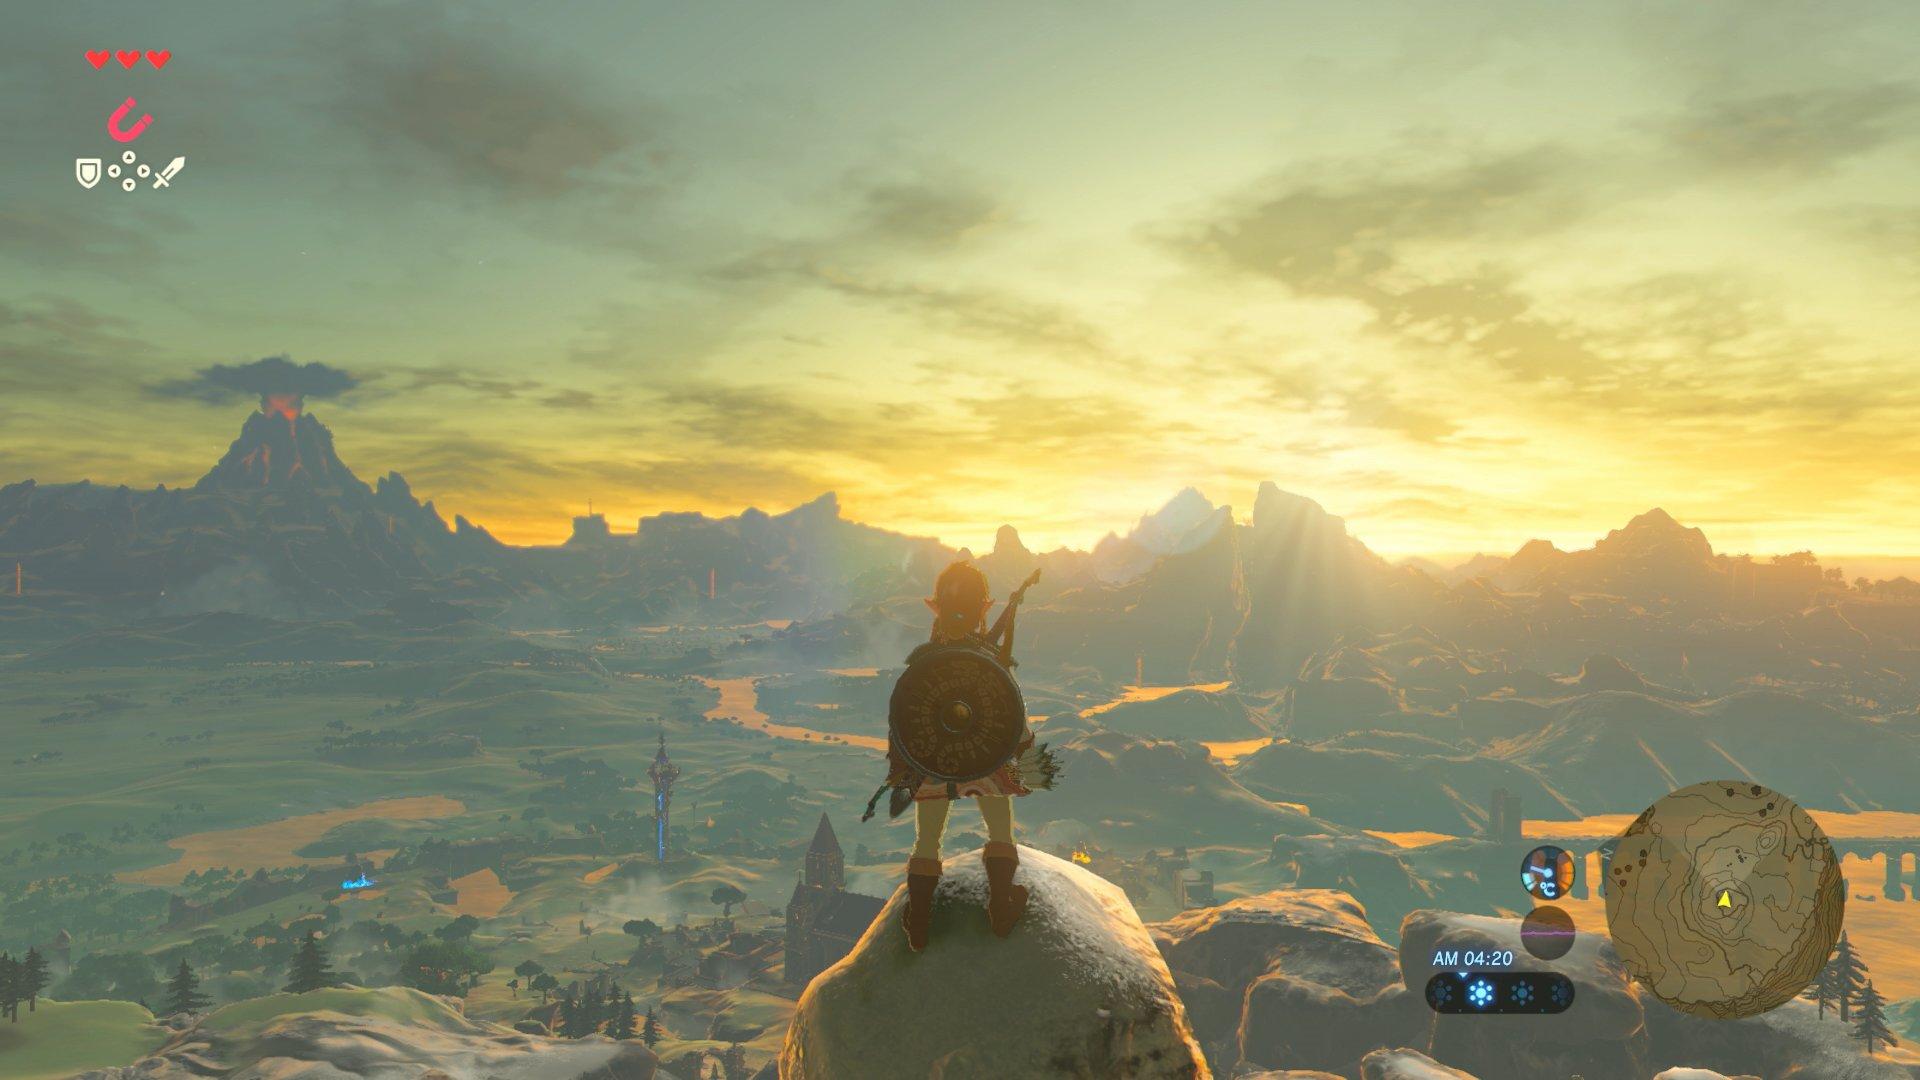 Nové screenshoty z The Legend of Zelda: Breath of the Wild 139293